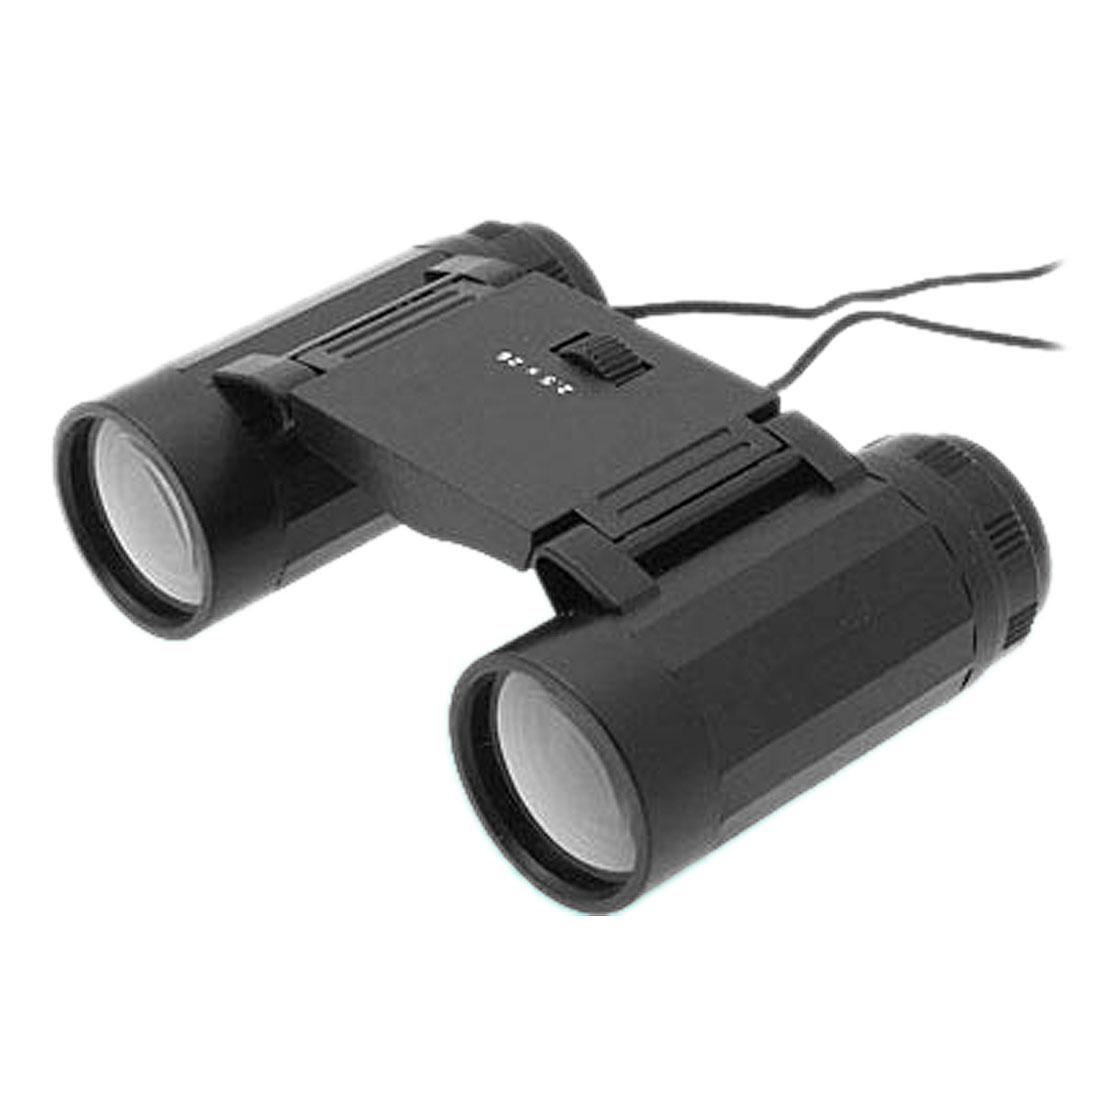 Compact Black Folding Binoculars 2.5 x 24 Telescope w Neck Strap for Children